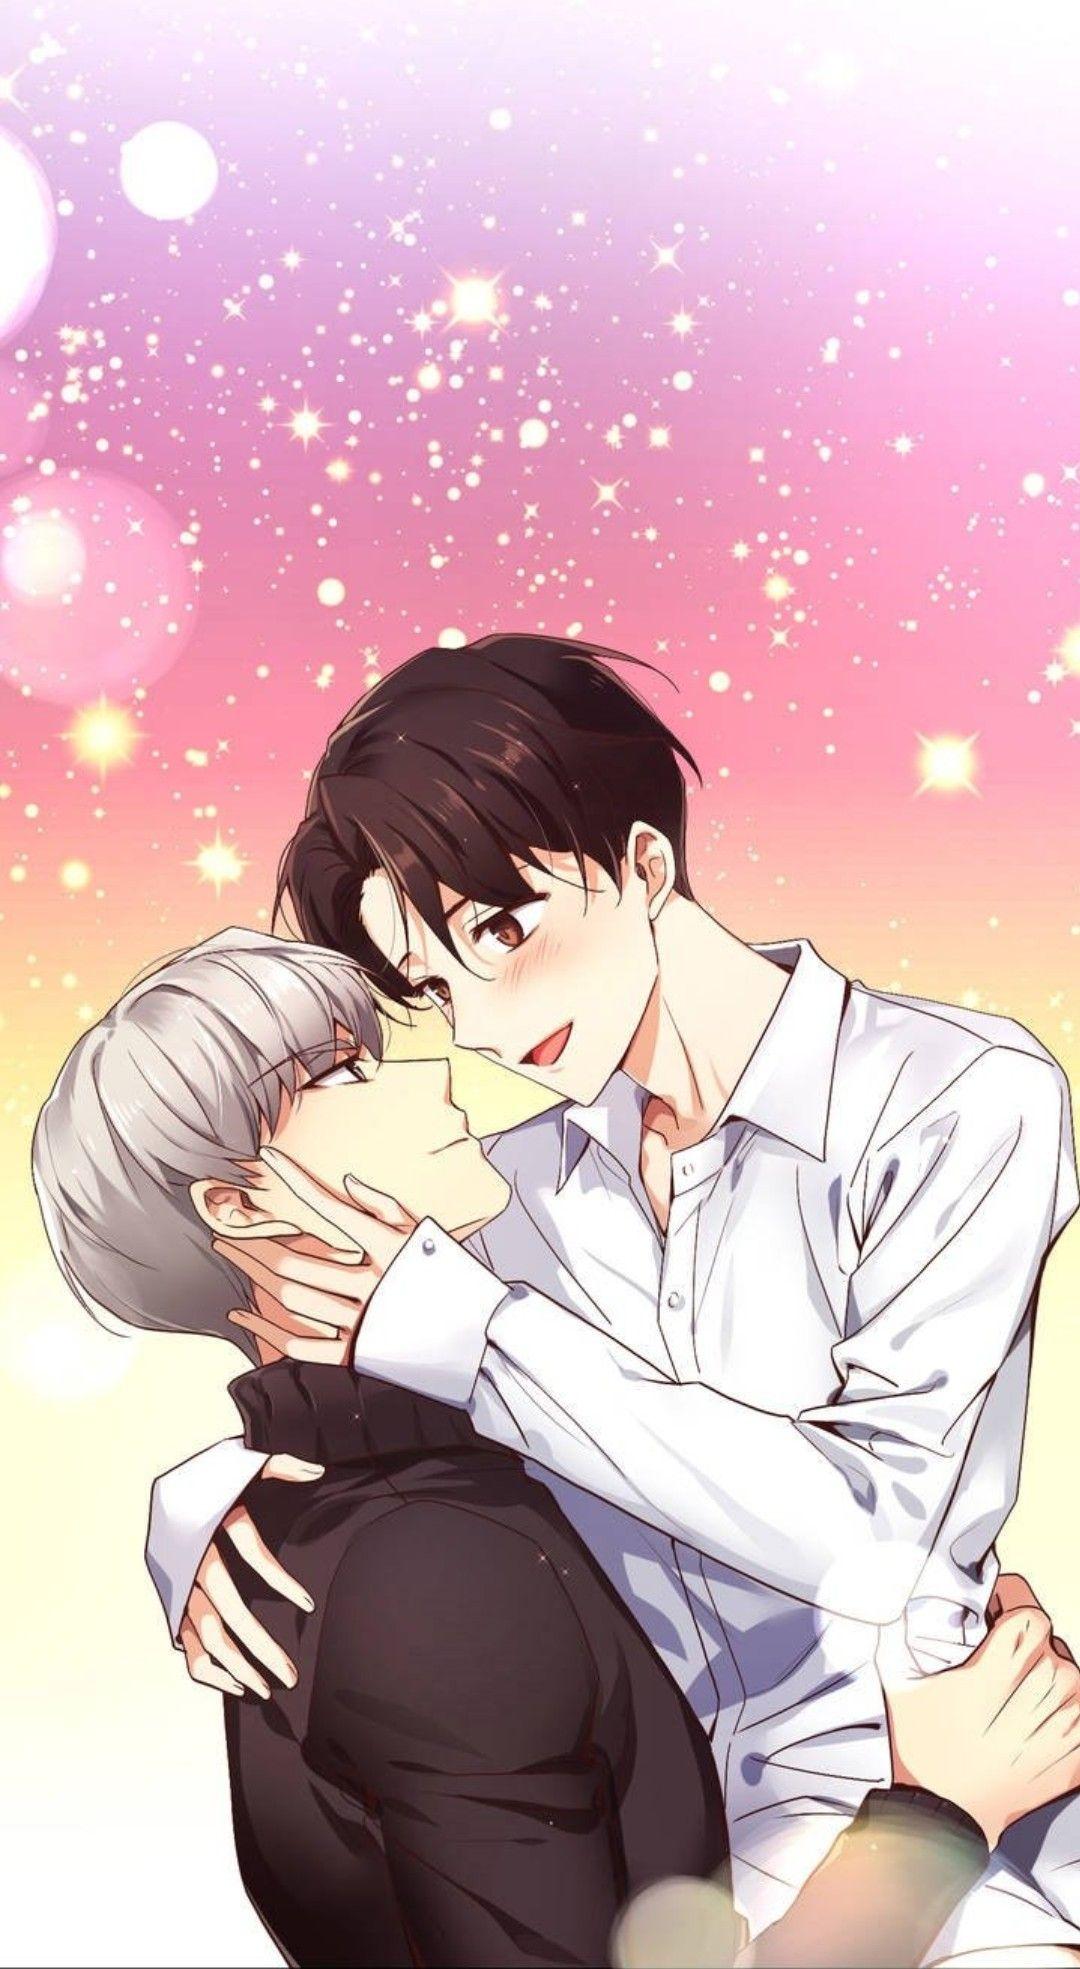 Pin By Jasmine On A Guy Like You With Images Anime Kawaii